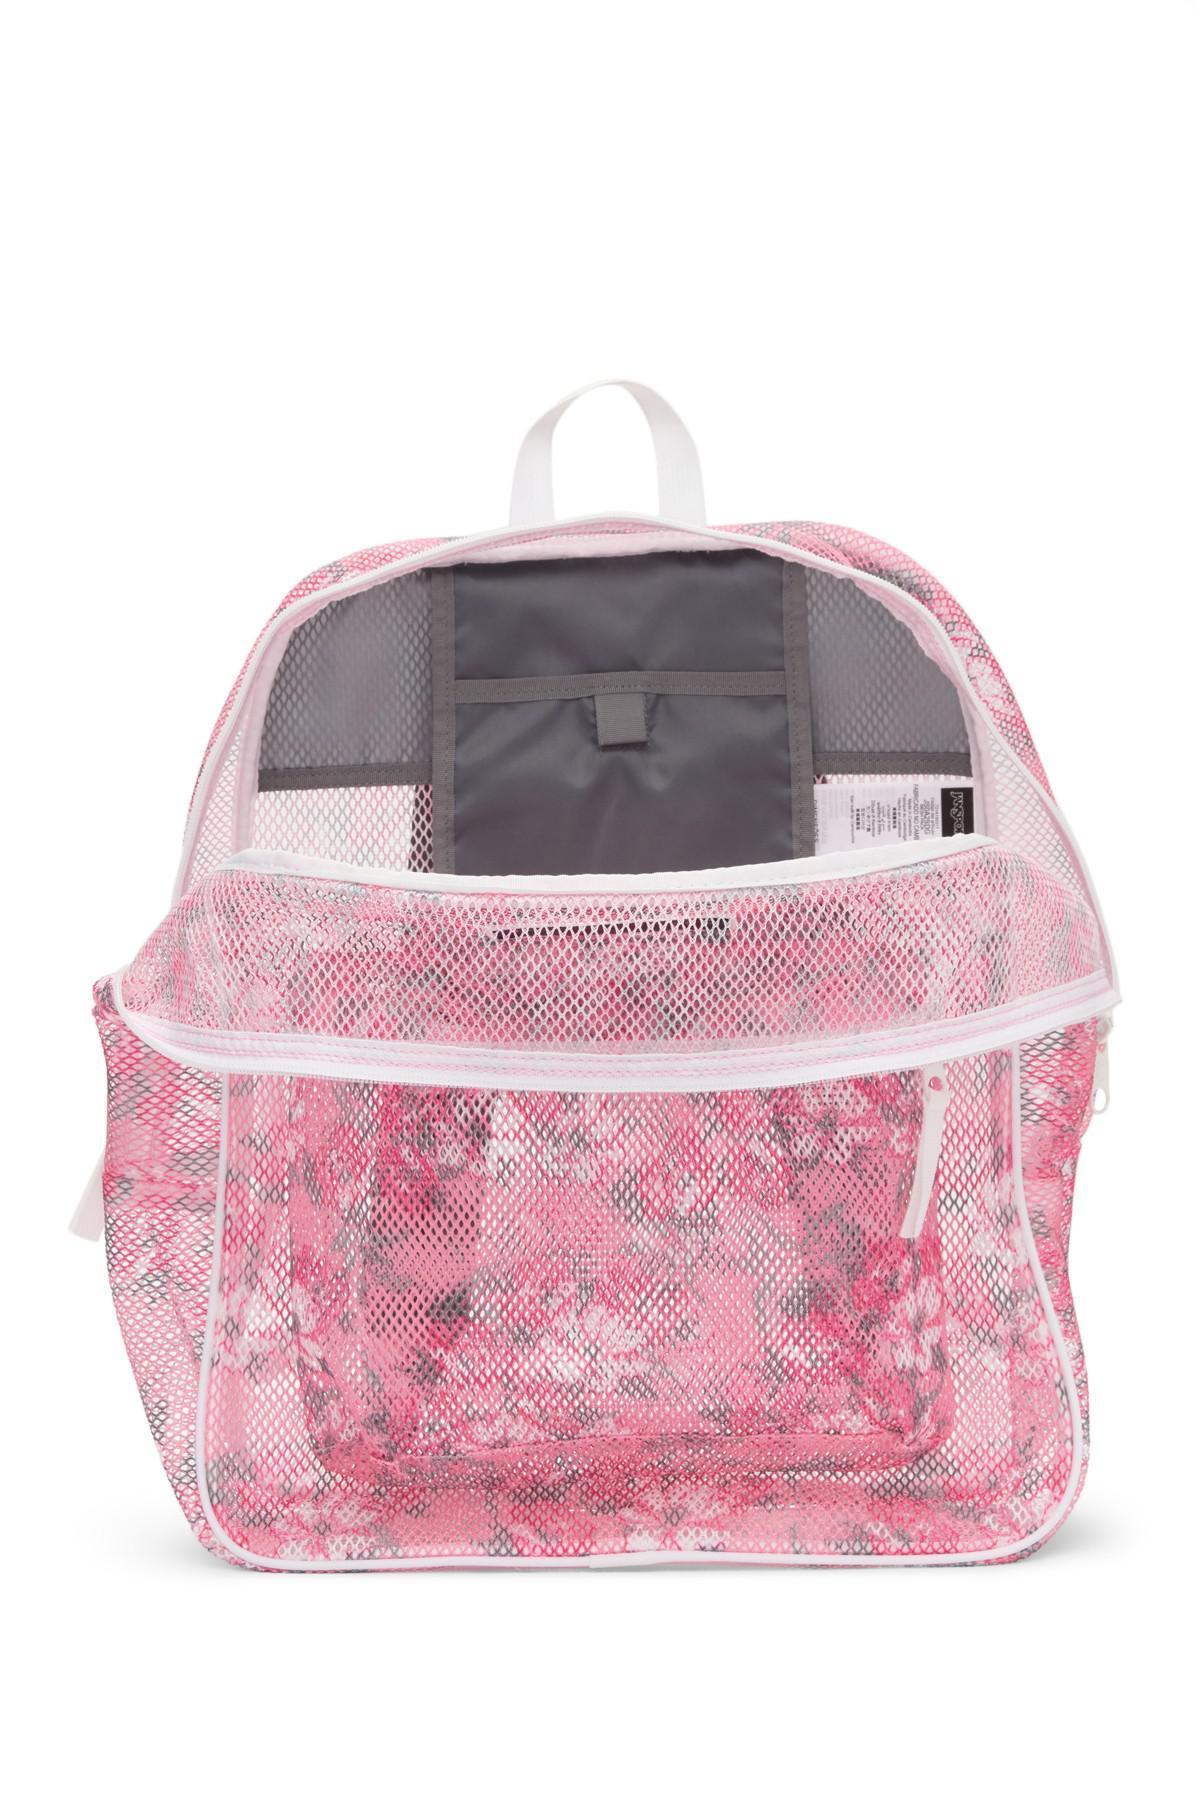 Pink Mesh Backpack- Fenix Toulouse Handball adb8cef0e8296